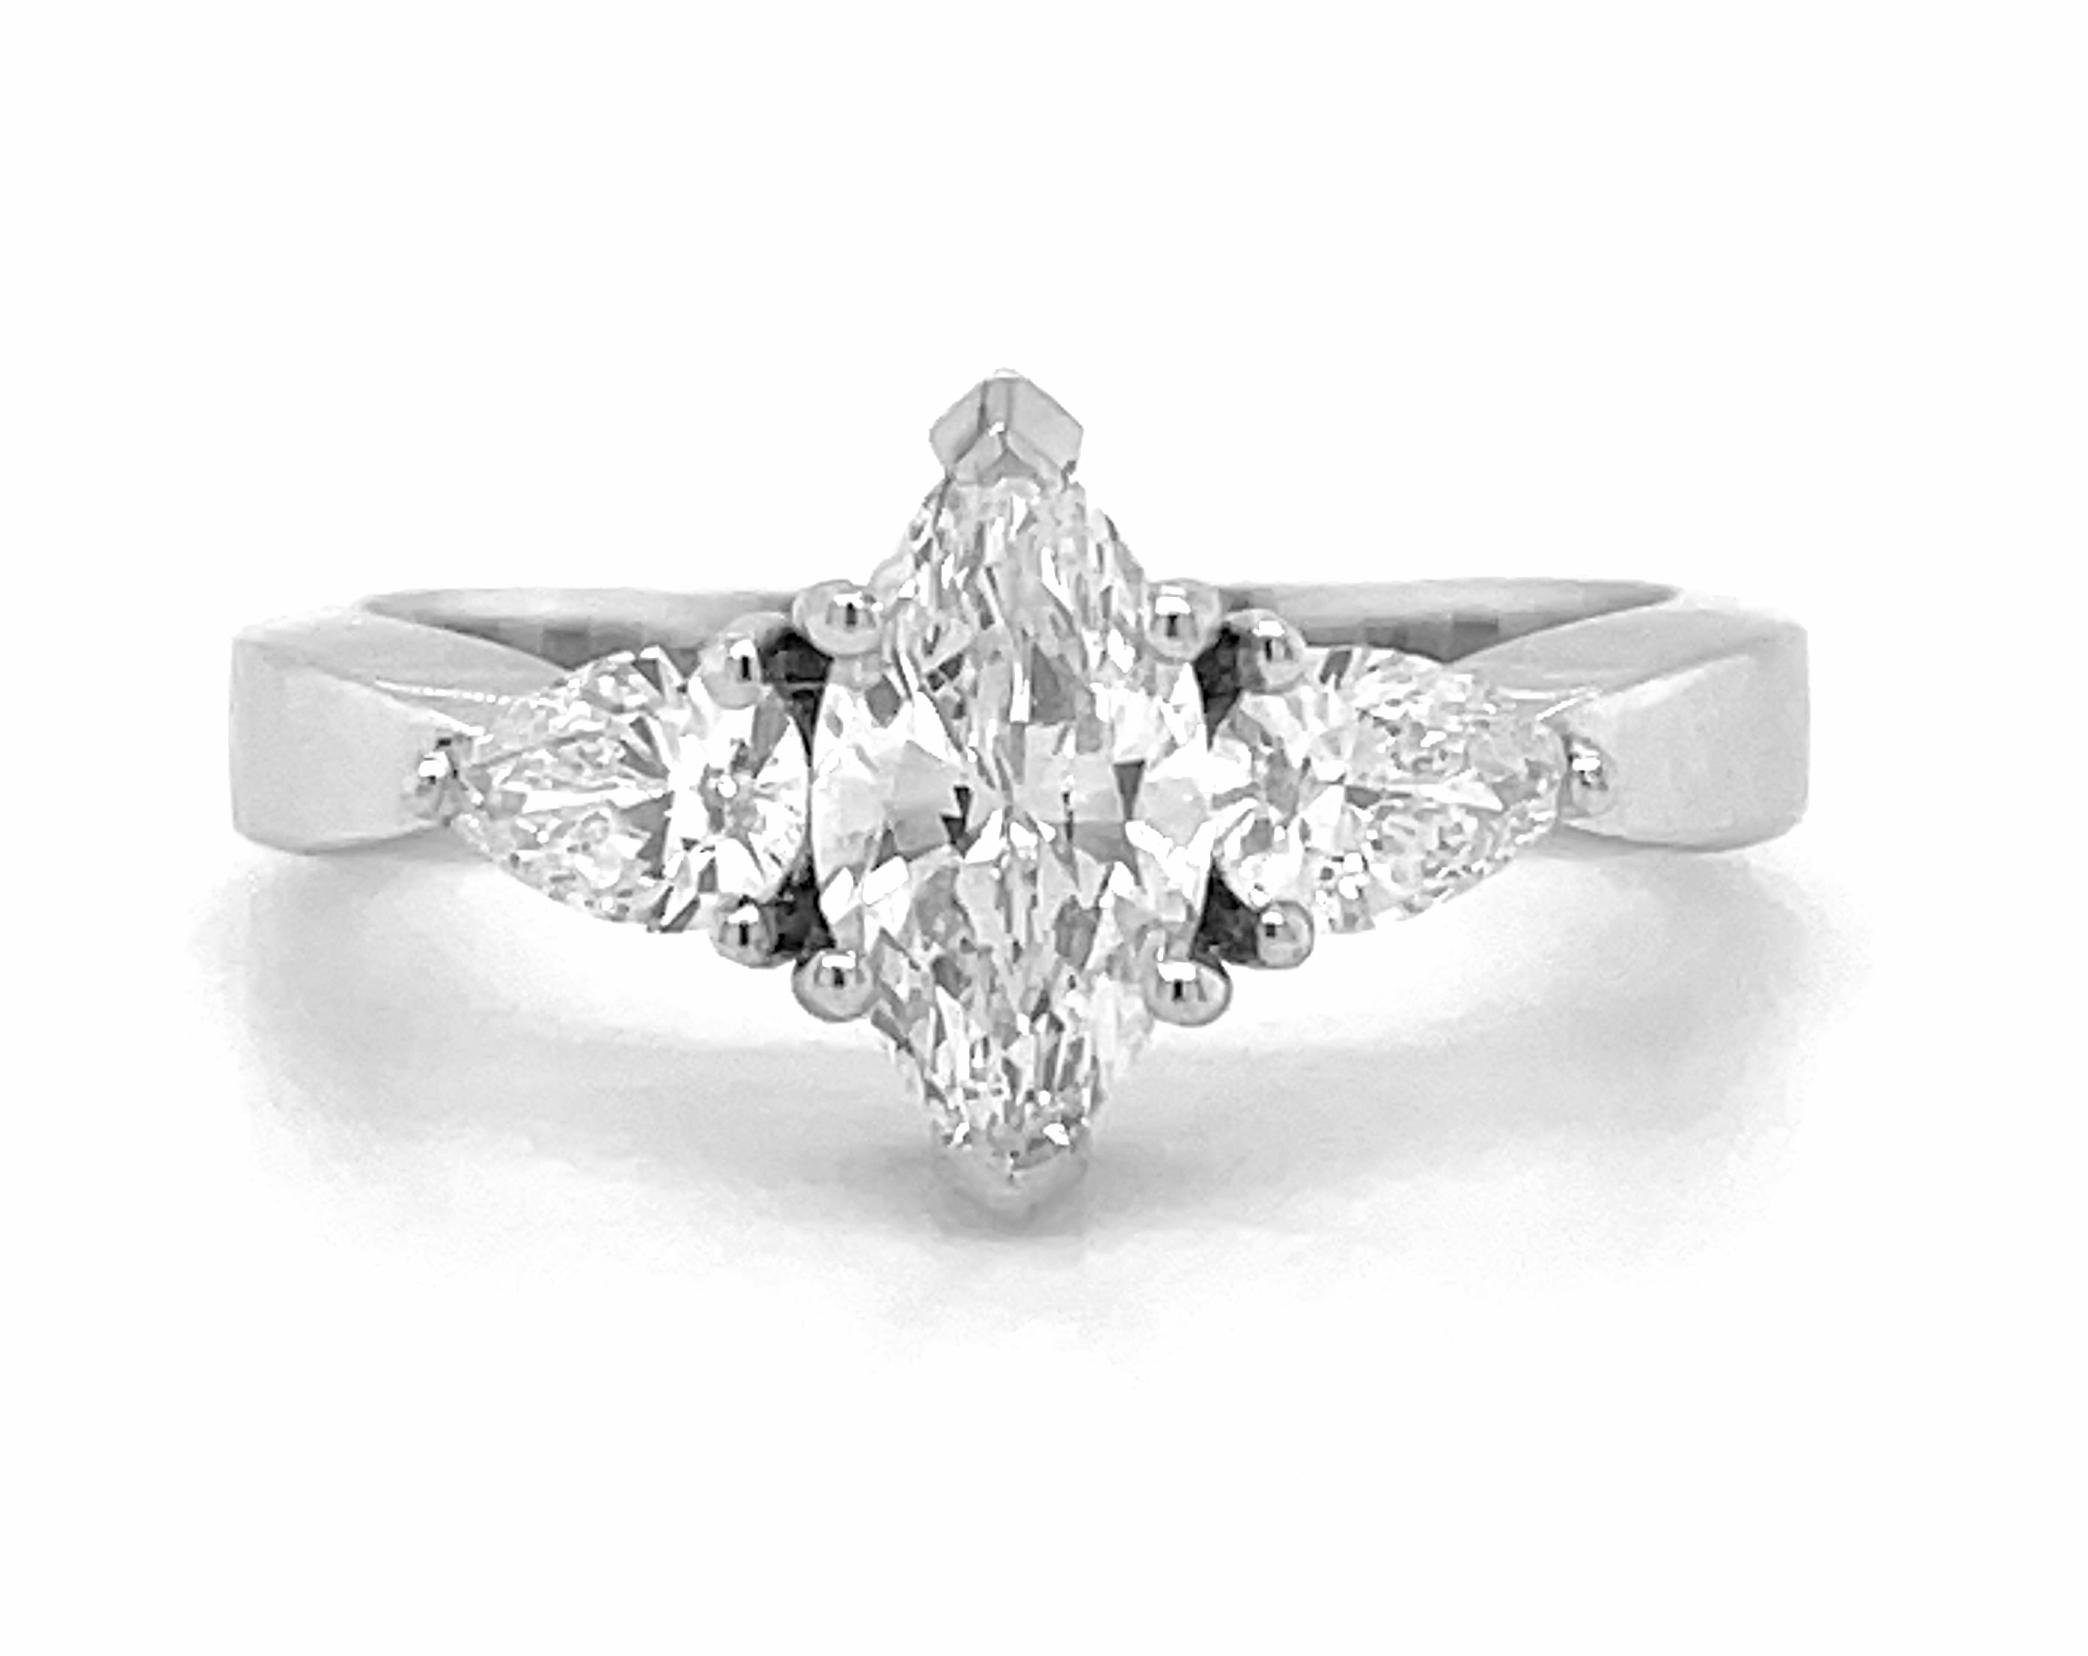 18k White Gold 3 Stone Marquise & Pearshape Diamond Ring